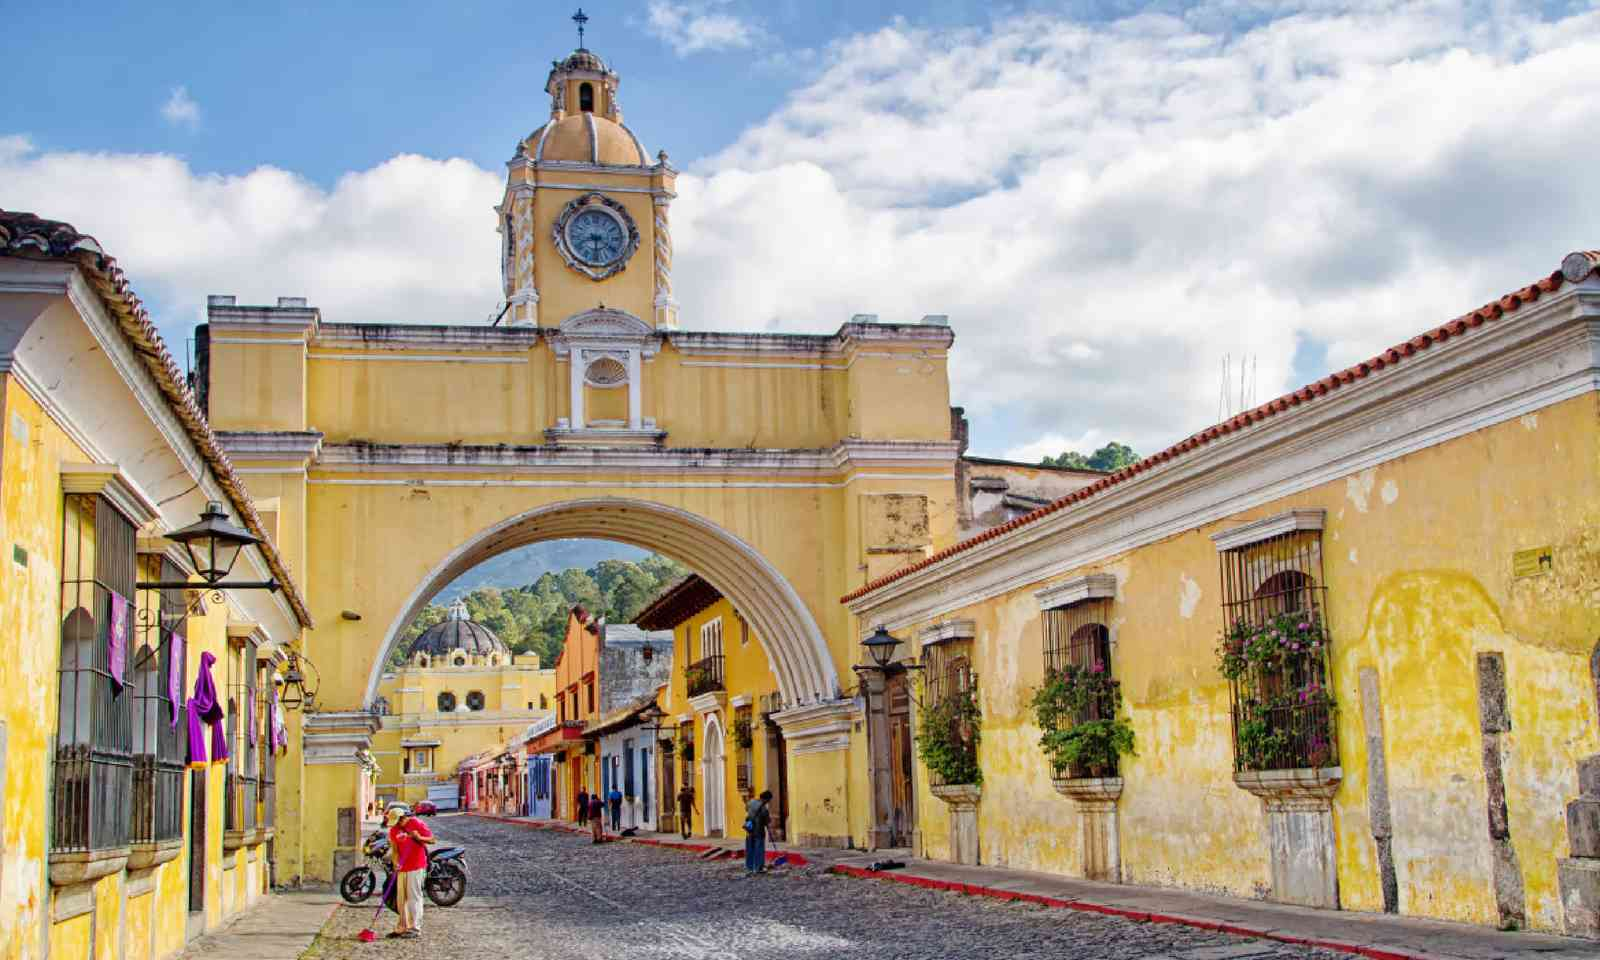 Colourful colonial buildings in Antigua, Guatemala (Shutterstock)